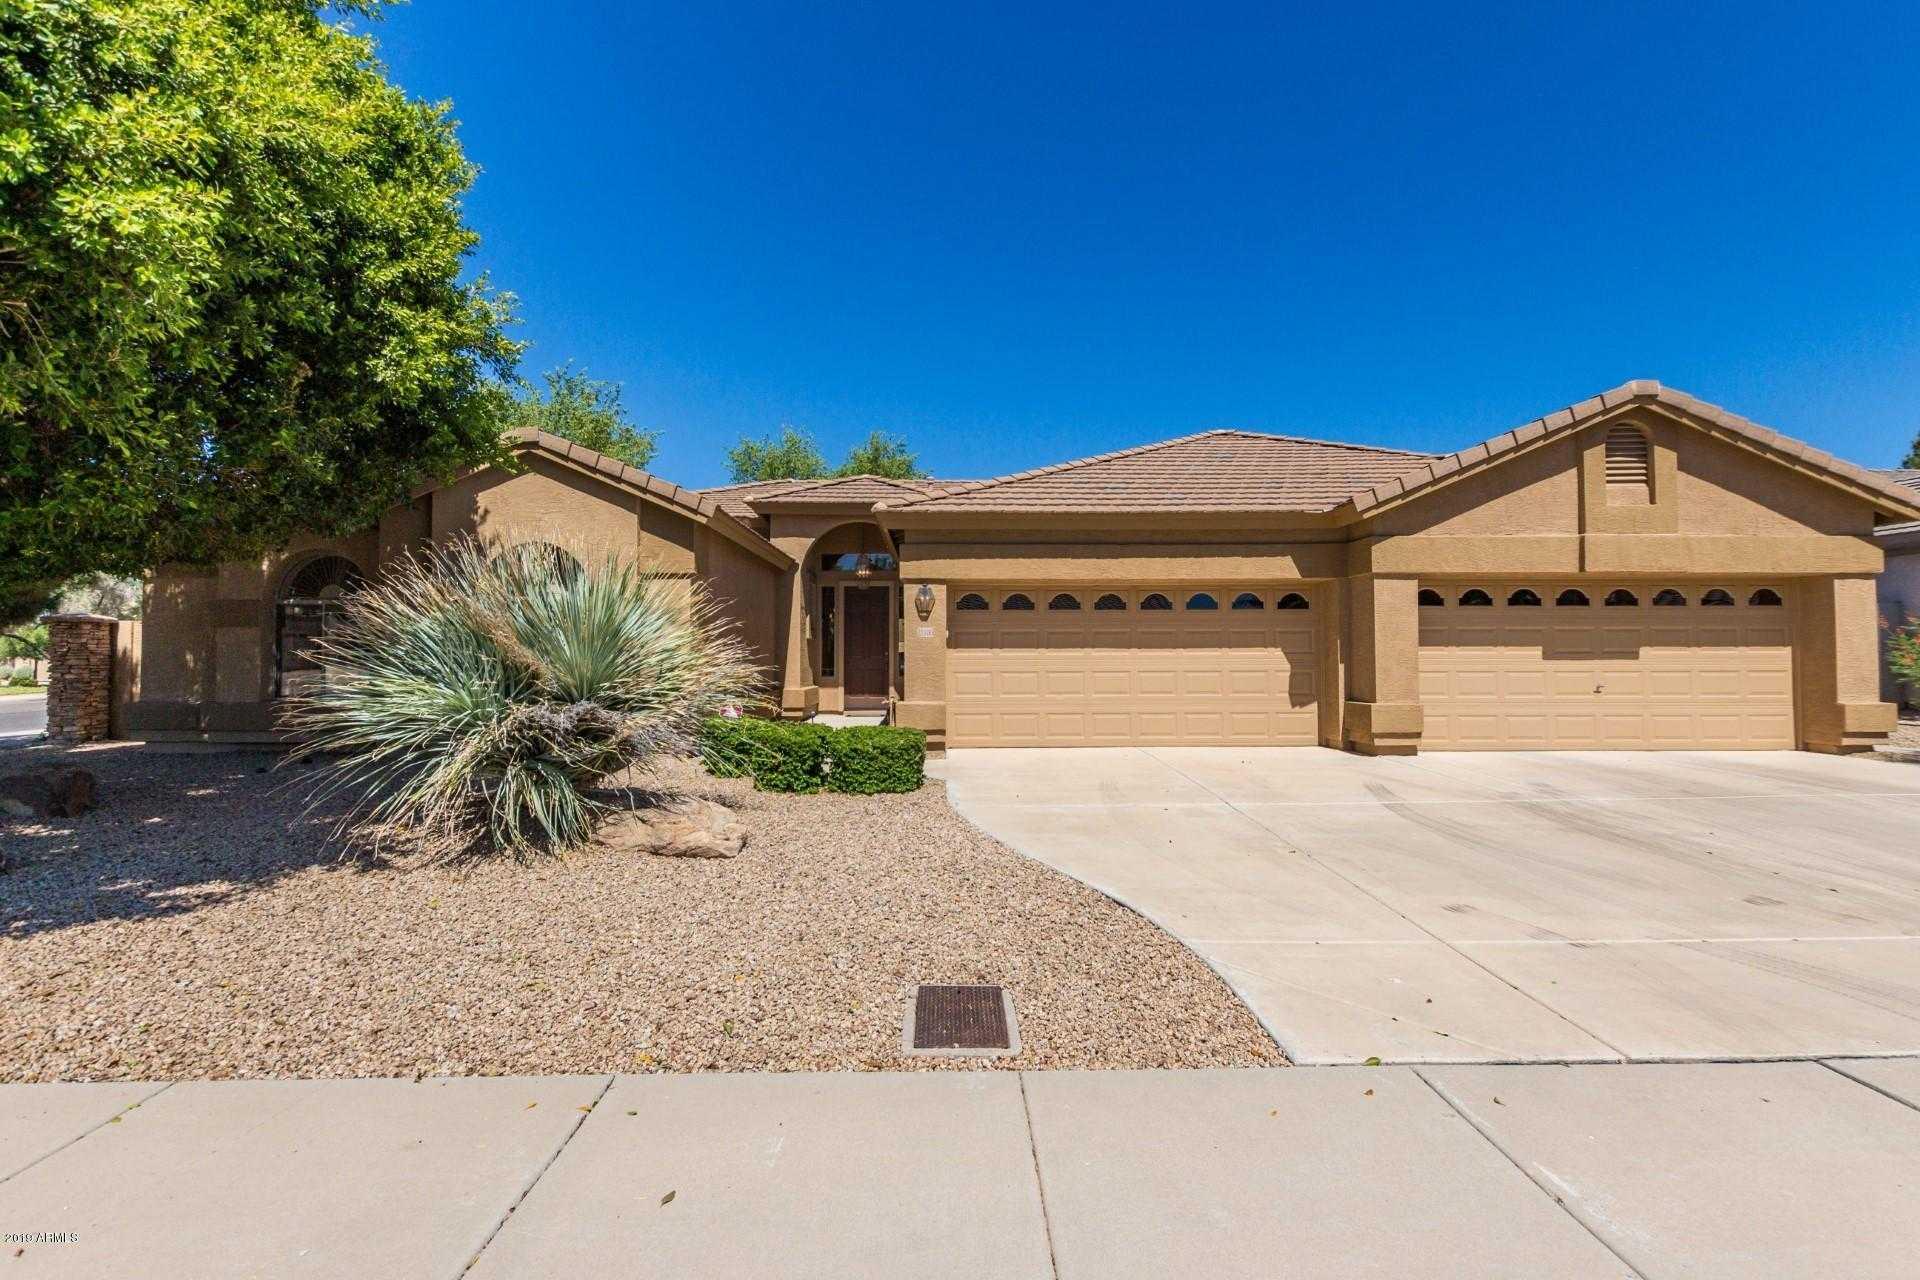 $480,000 - 4Br/3Ba - Home for Sale in Sierra Verde Parcel C, Glendale